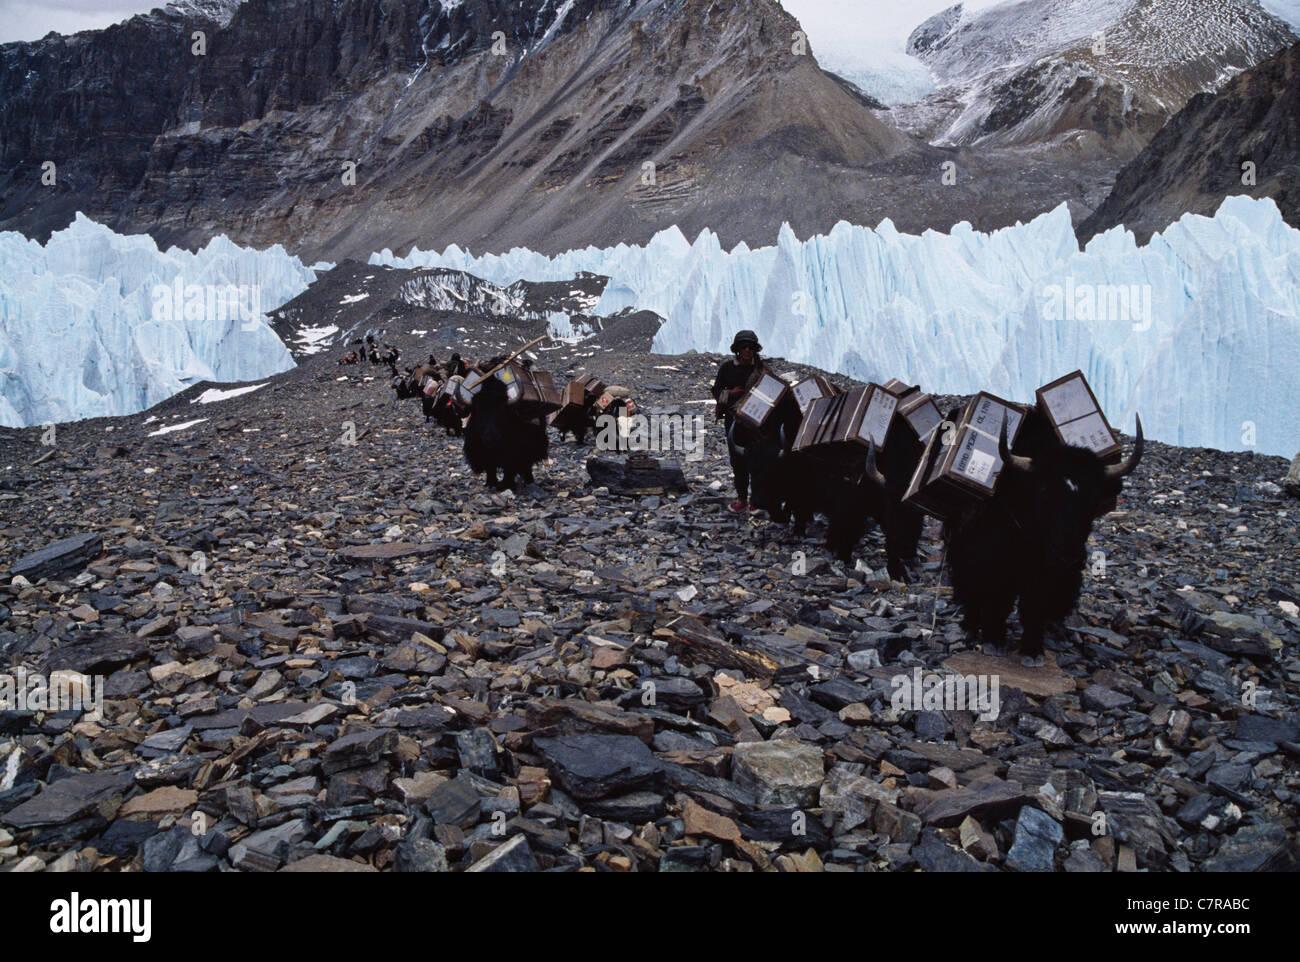 Yak caravan in Rongbuk Glacier enroute to Mt. Everest, Tibet, China - Stock Image